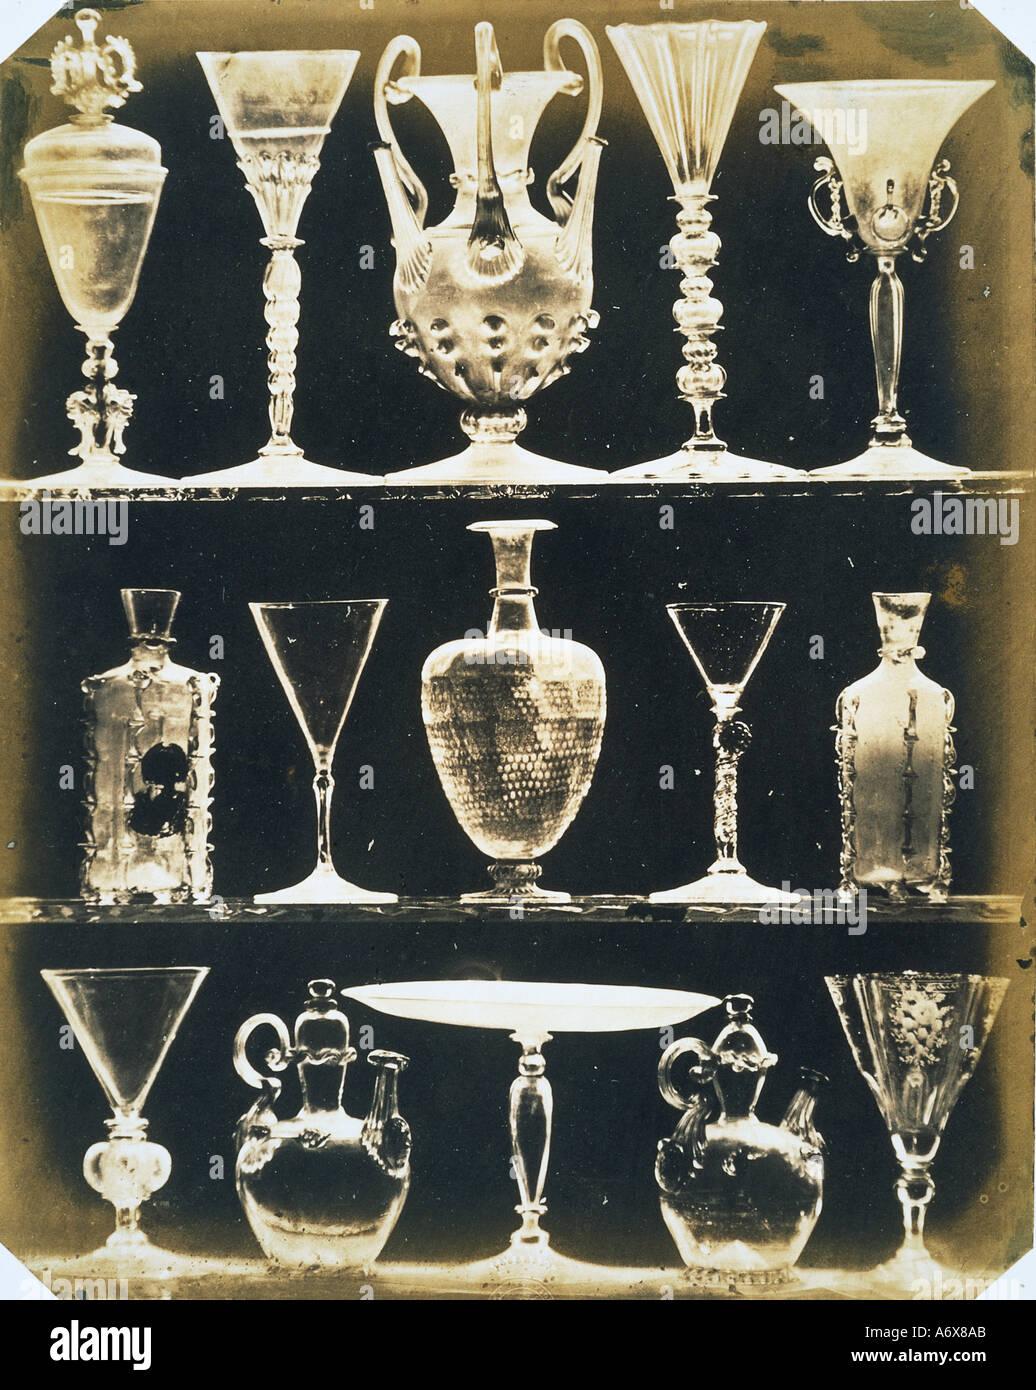 Venezianische Vasen und Gläser. Foto von Ludwig Belitski. Venedig, Italien, 1855. Stockbild